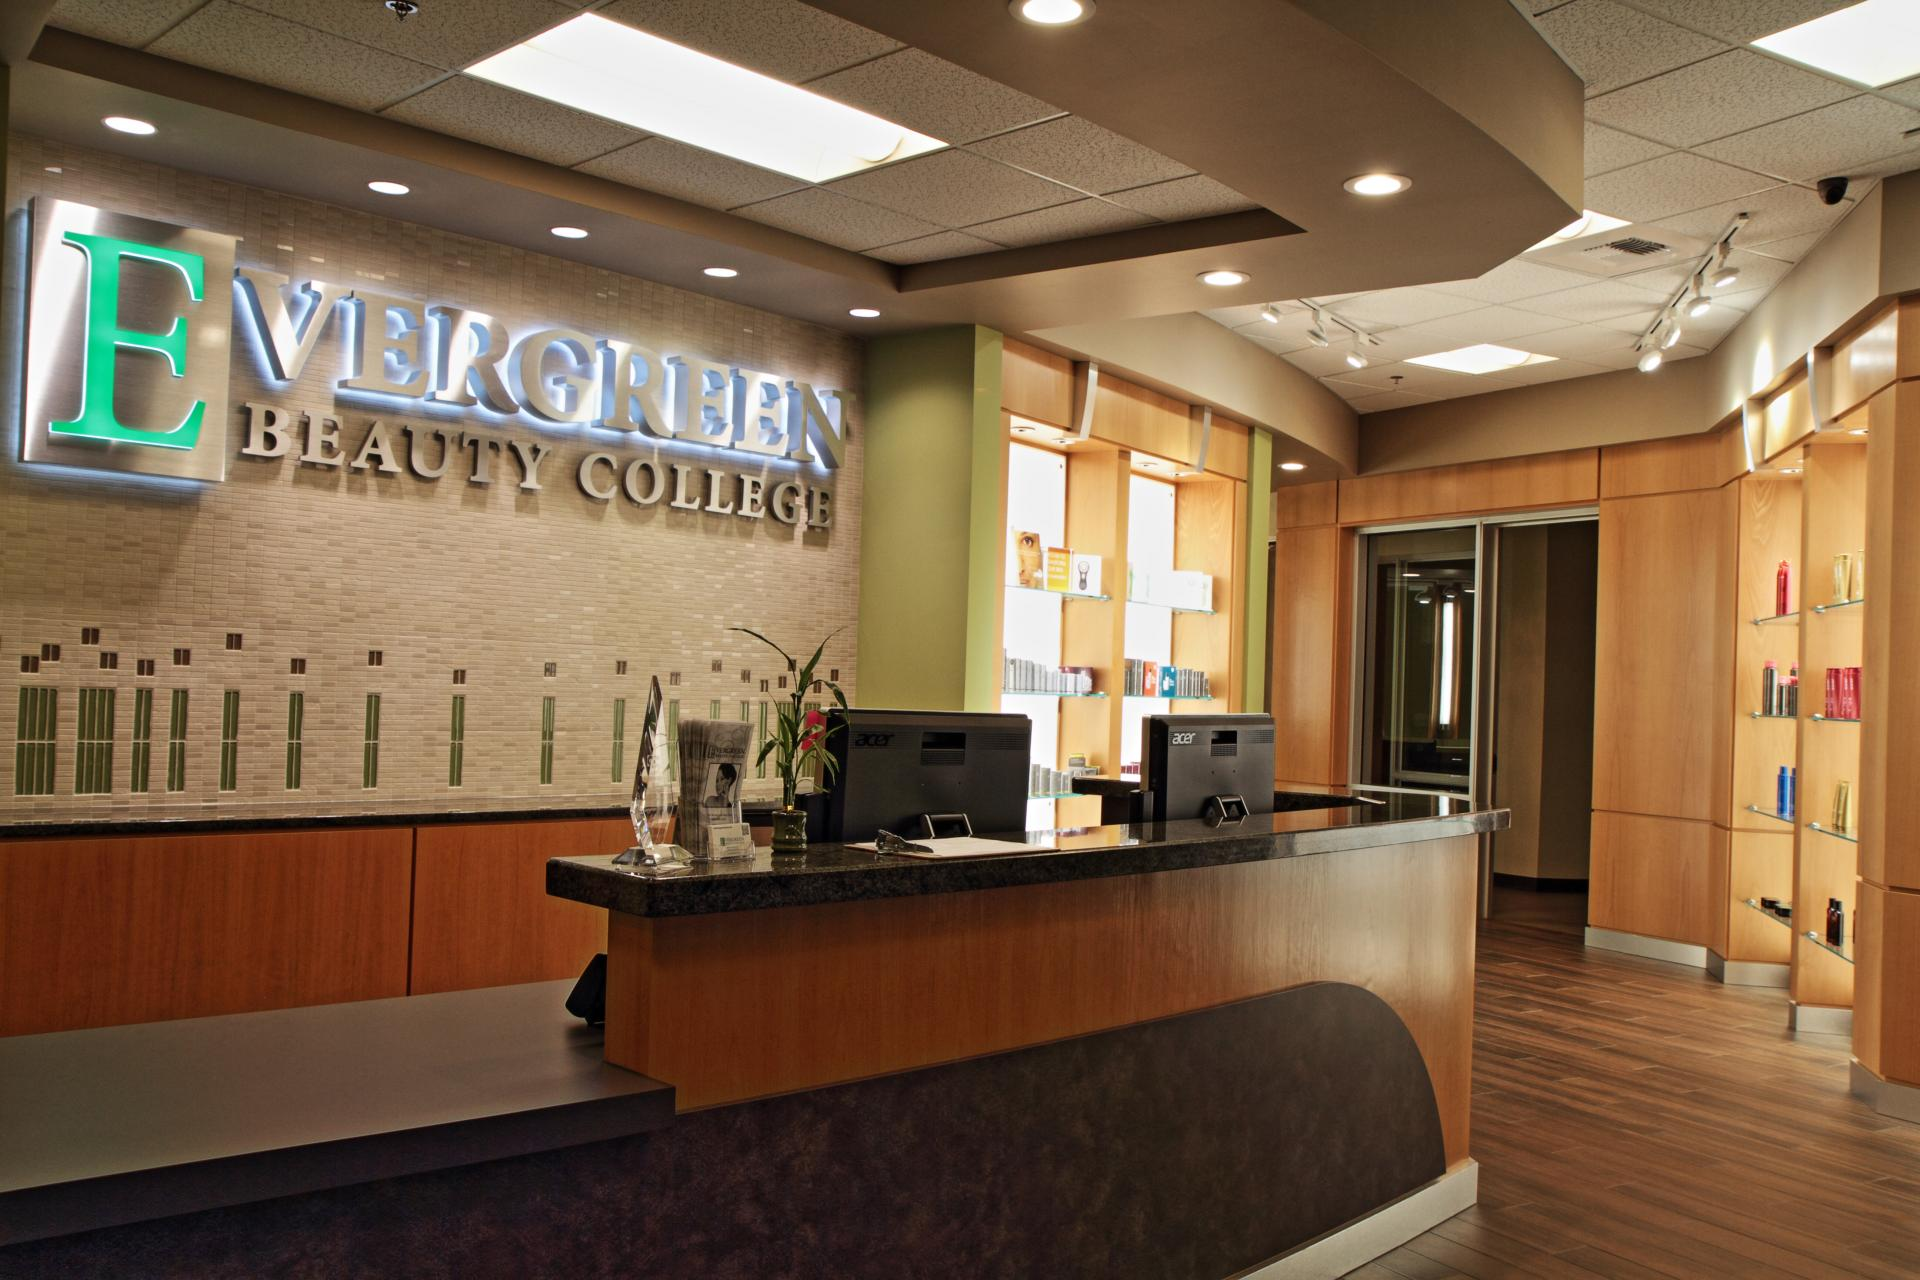 CONGRATS Evergreen Beauty College!